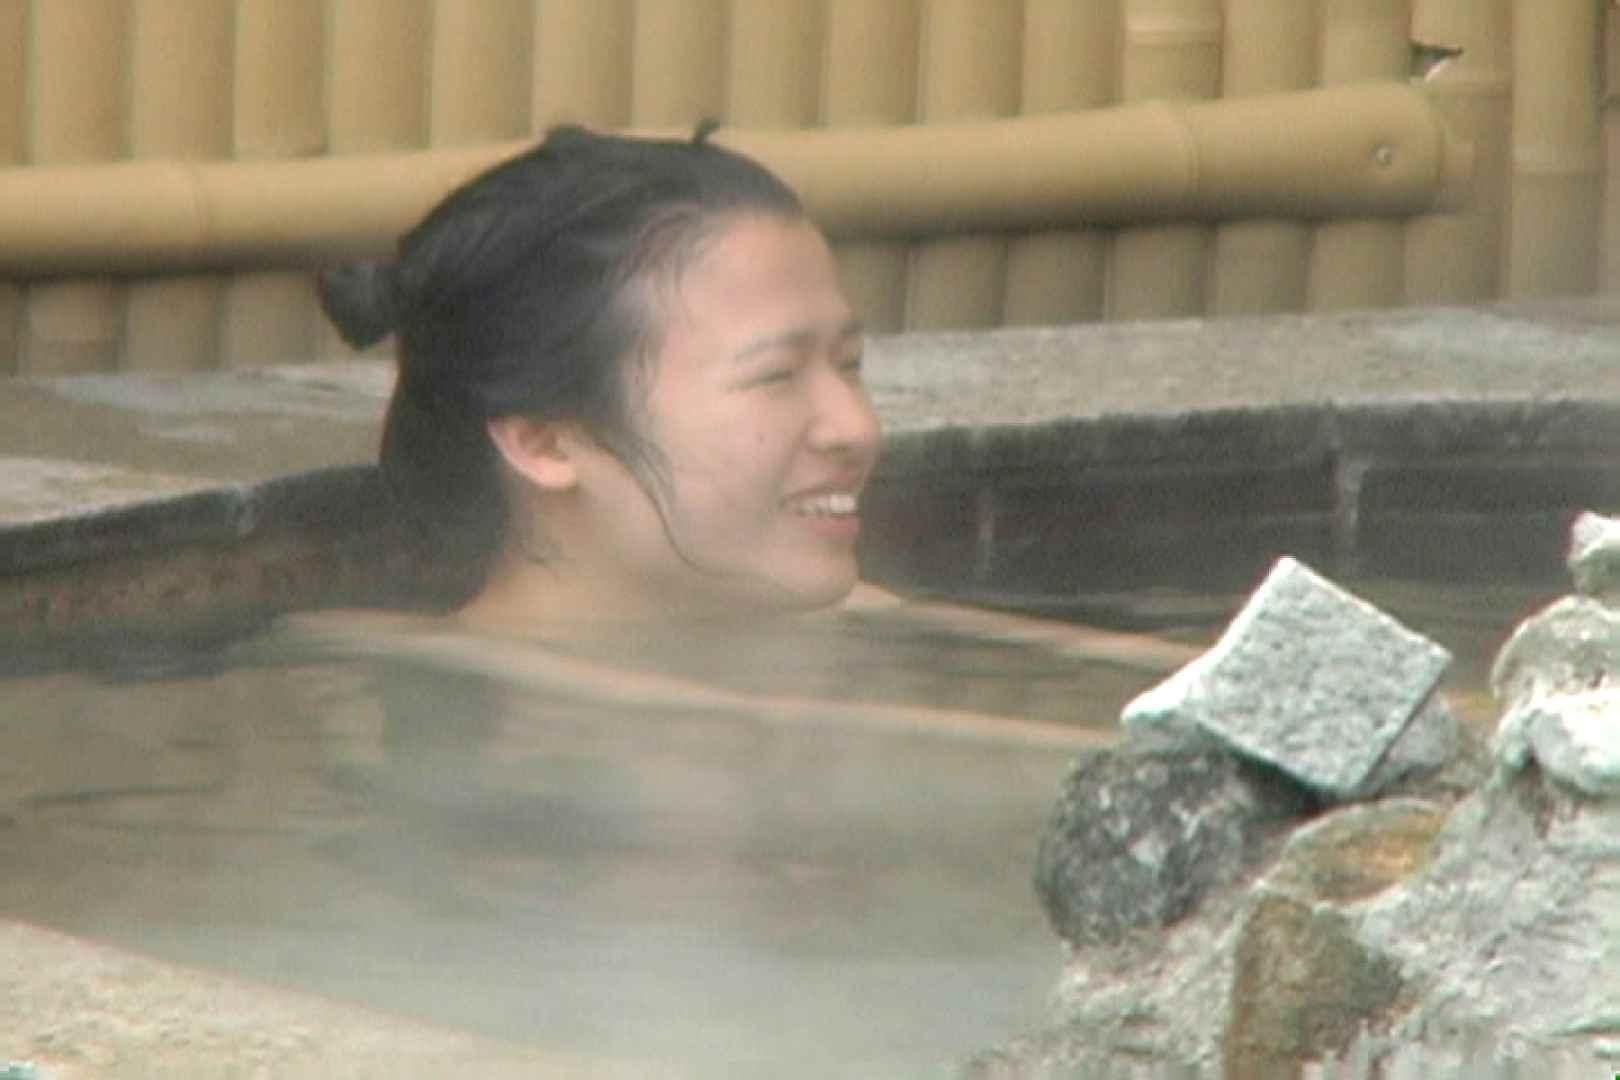 Aquaな露天風呂Vol.647 0   0  58連発 15